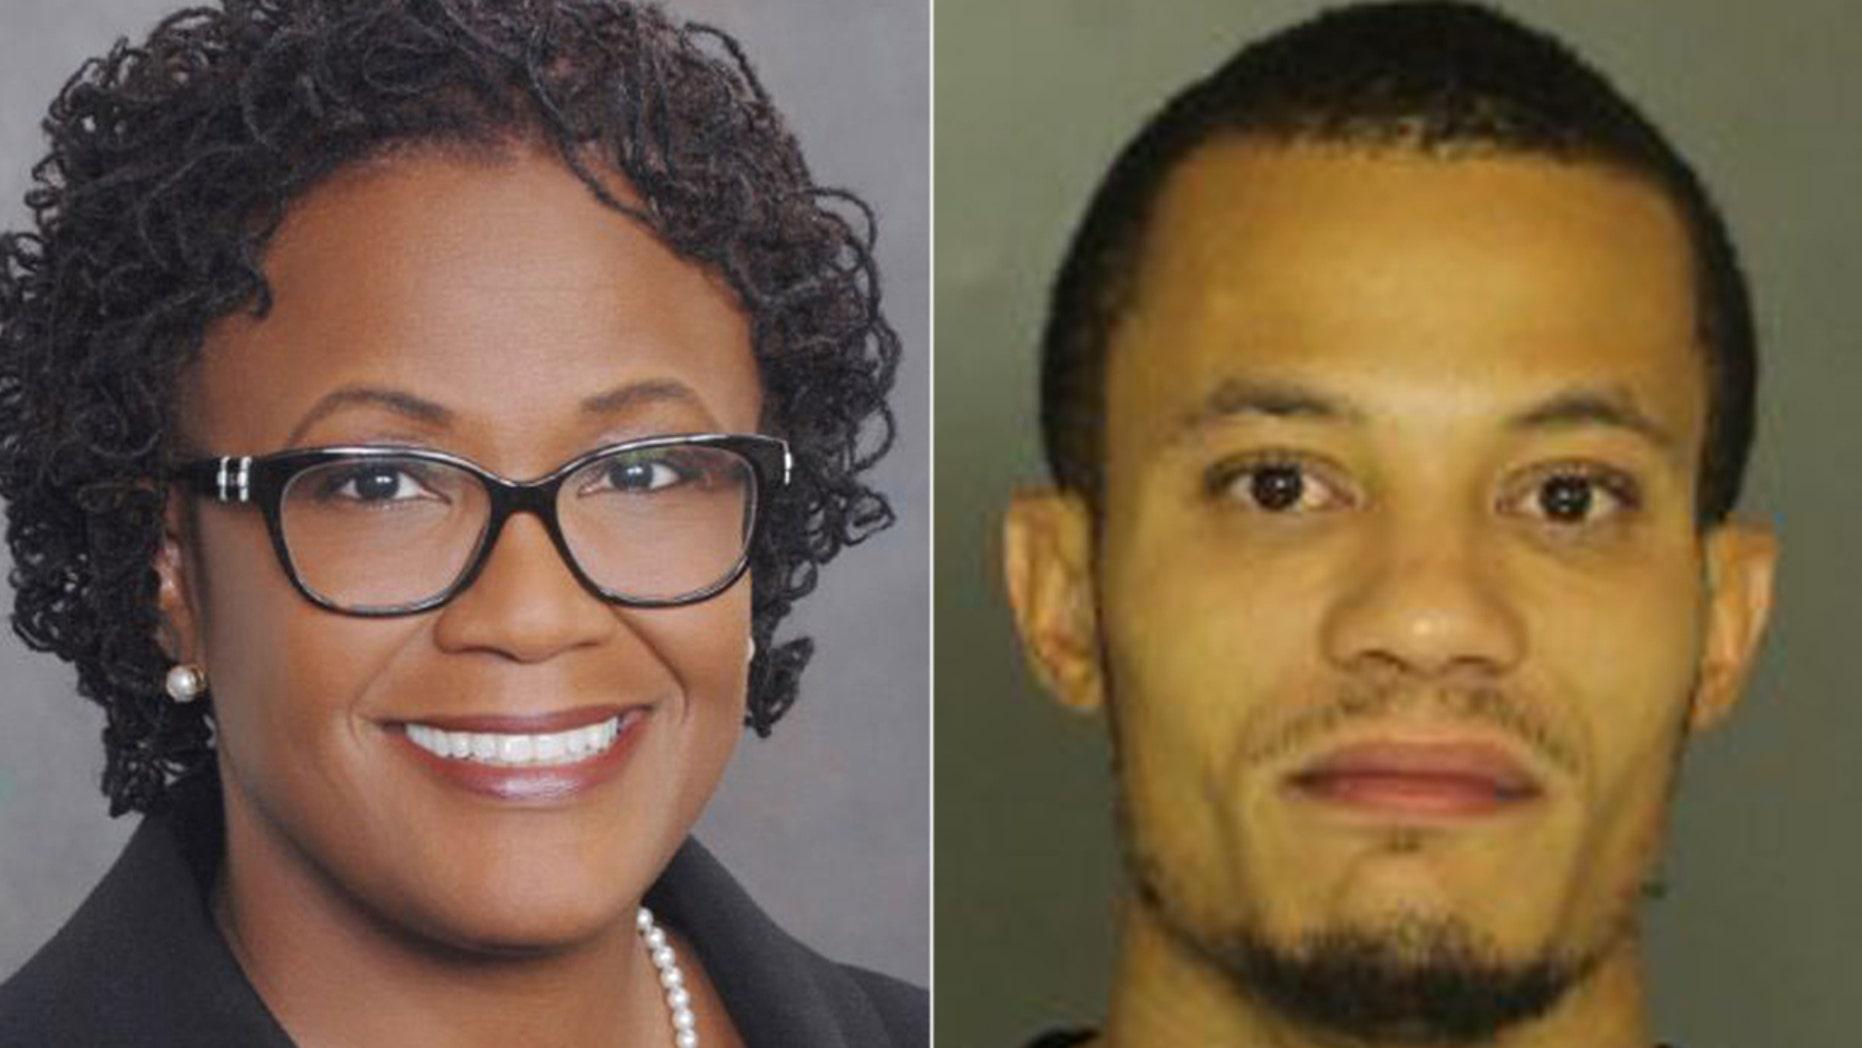 Mayor Kim Bracey of York, Pa. and a mugshot (r) of her son Brandon Anderson, 30